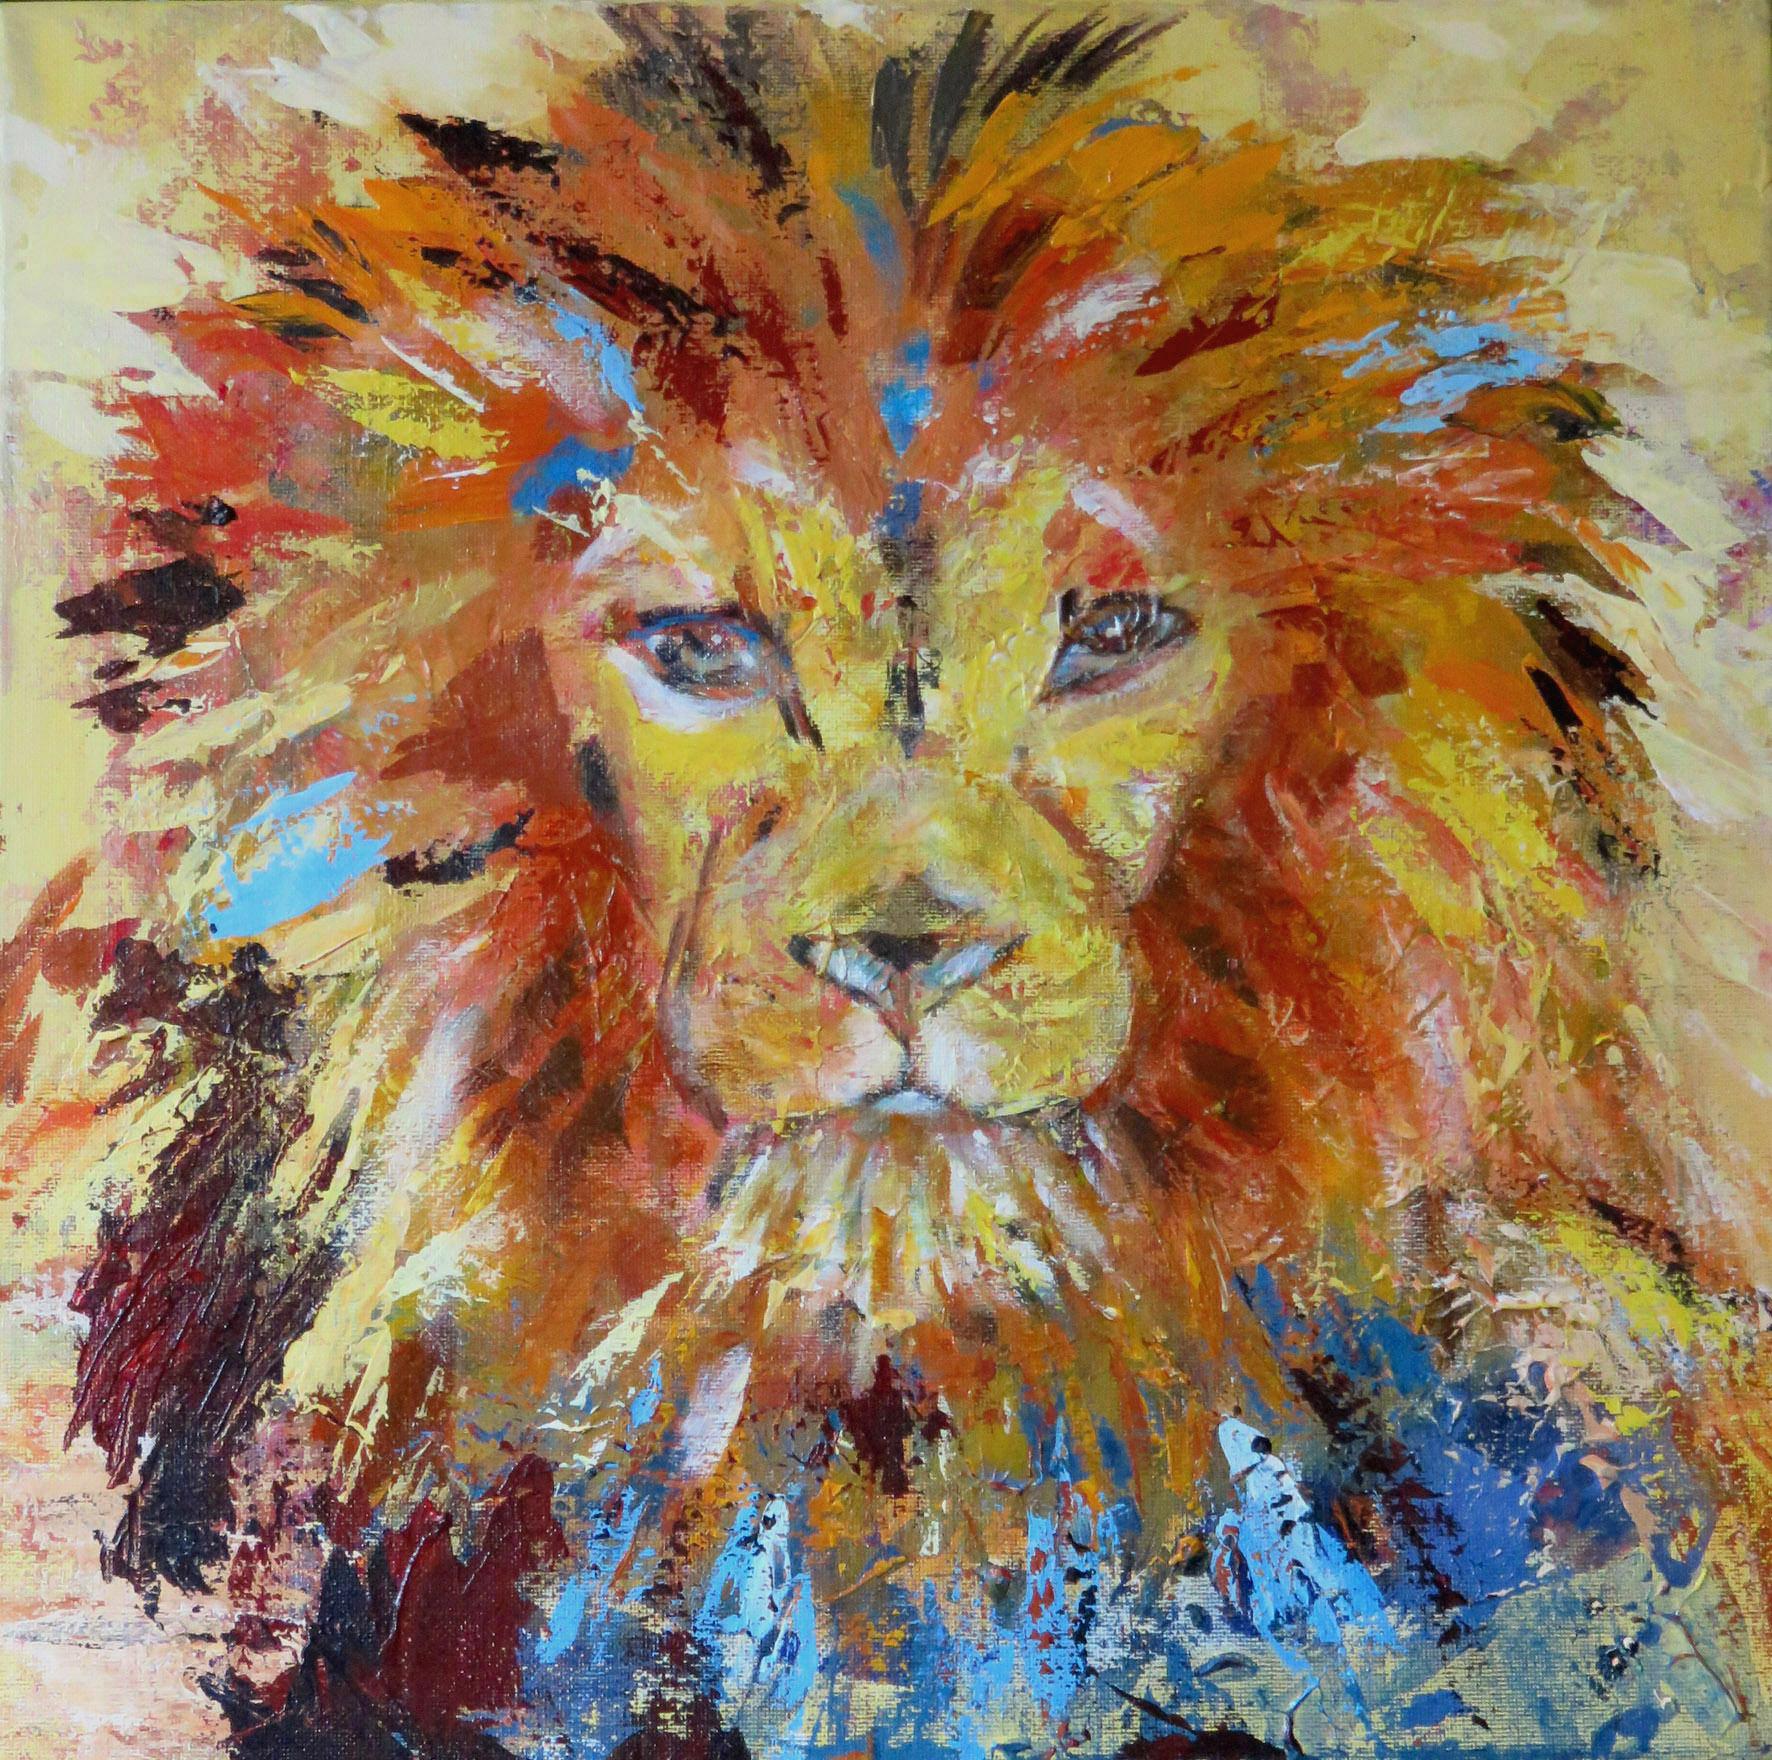 Lion - Juillet 2017